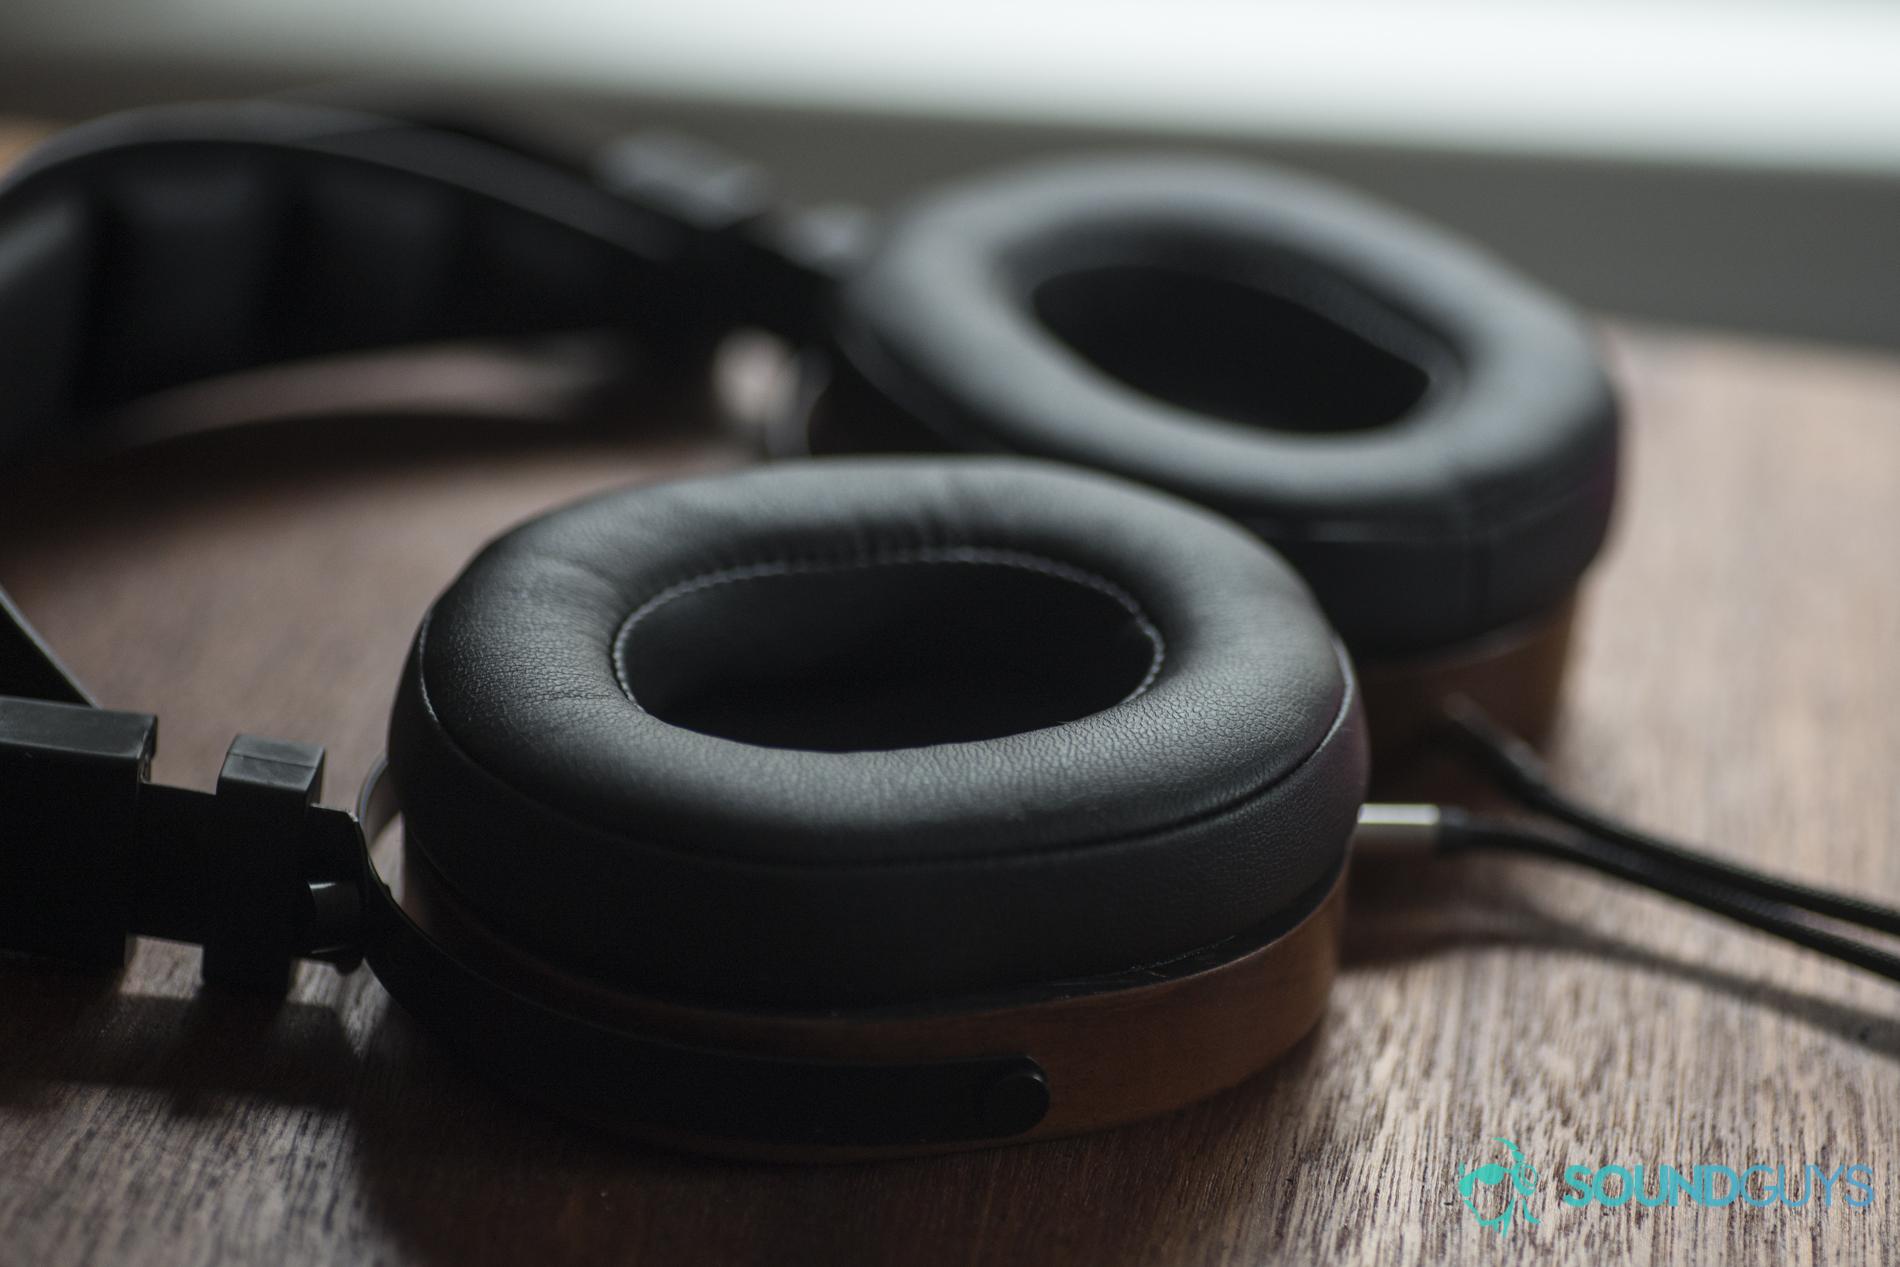 Monoprice Monolith M565 Review - SoundGuys